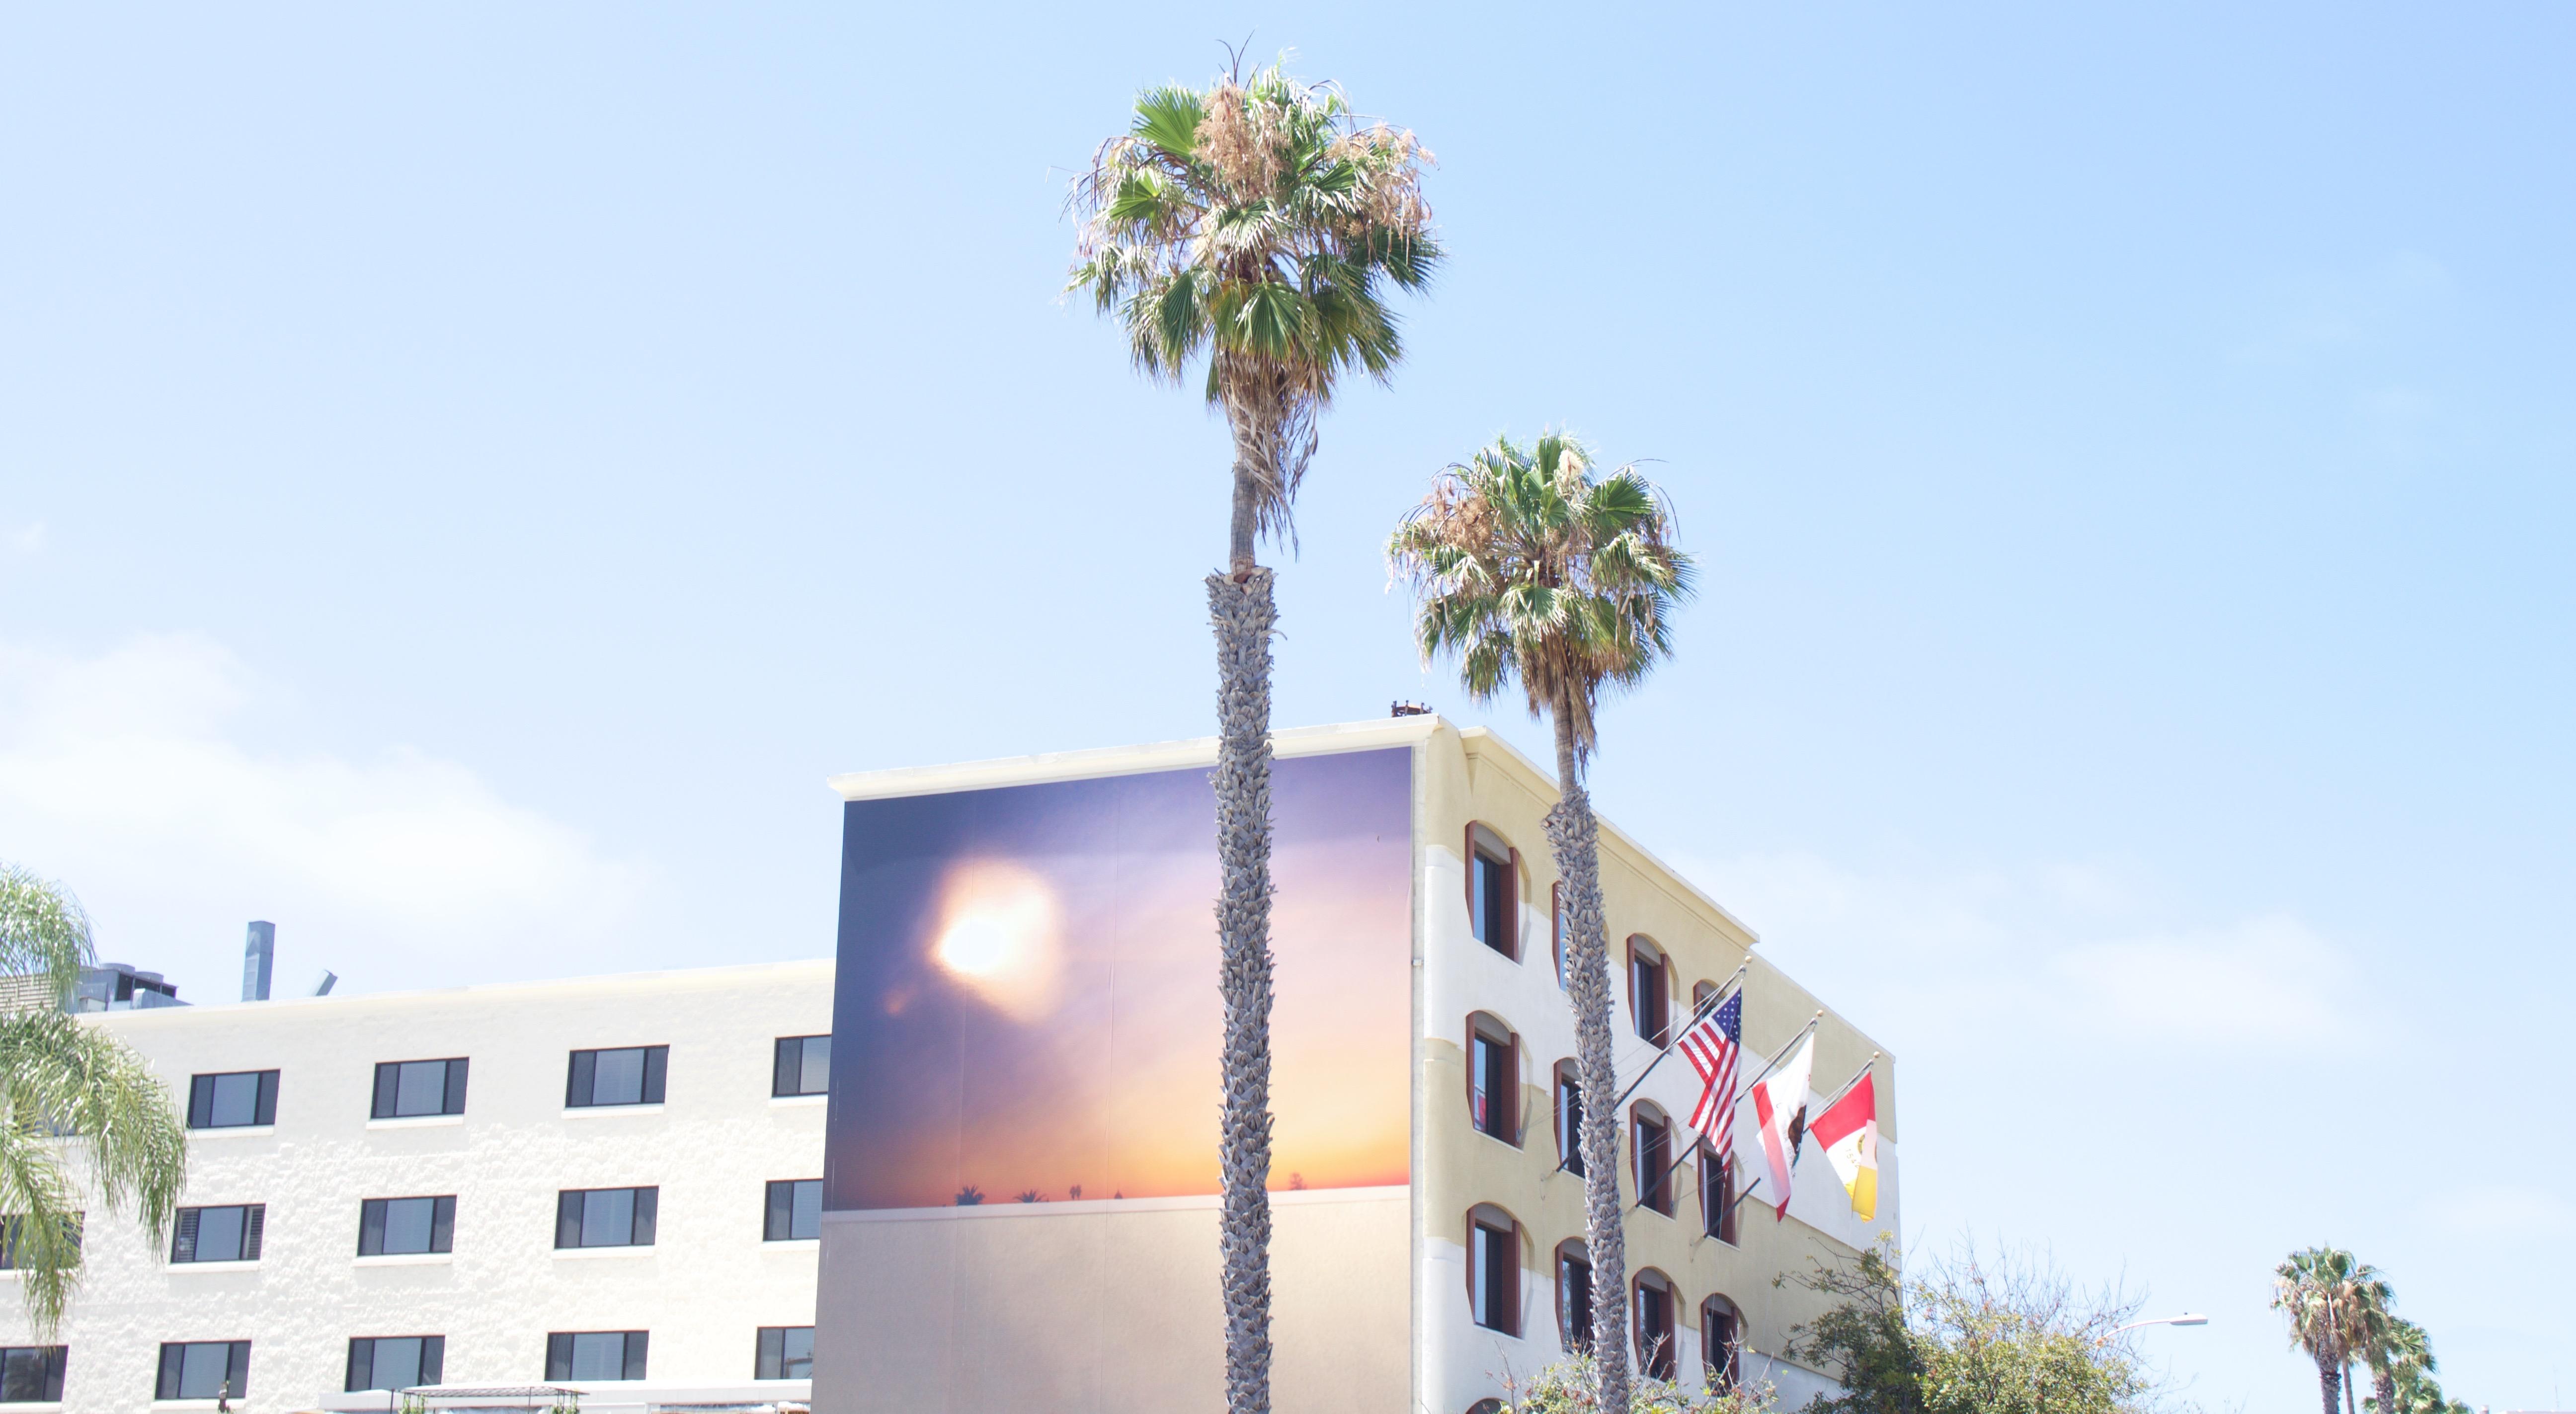 La Jolla - My Styled Life